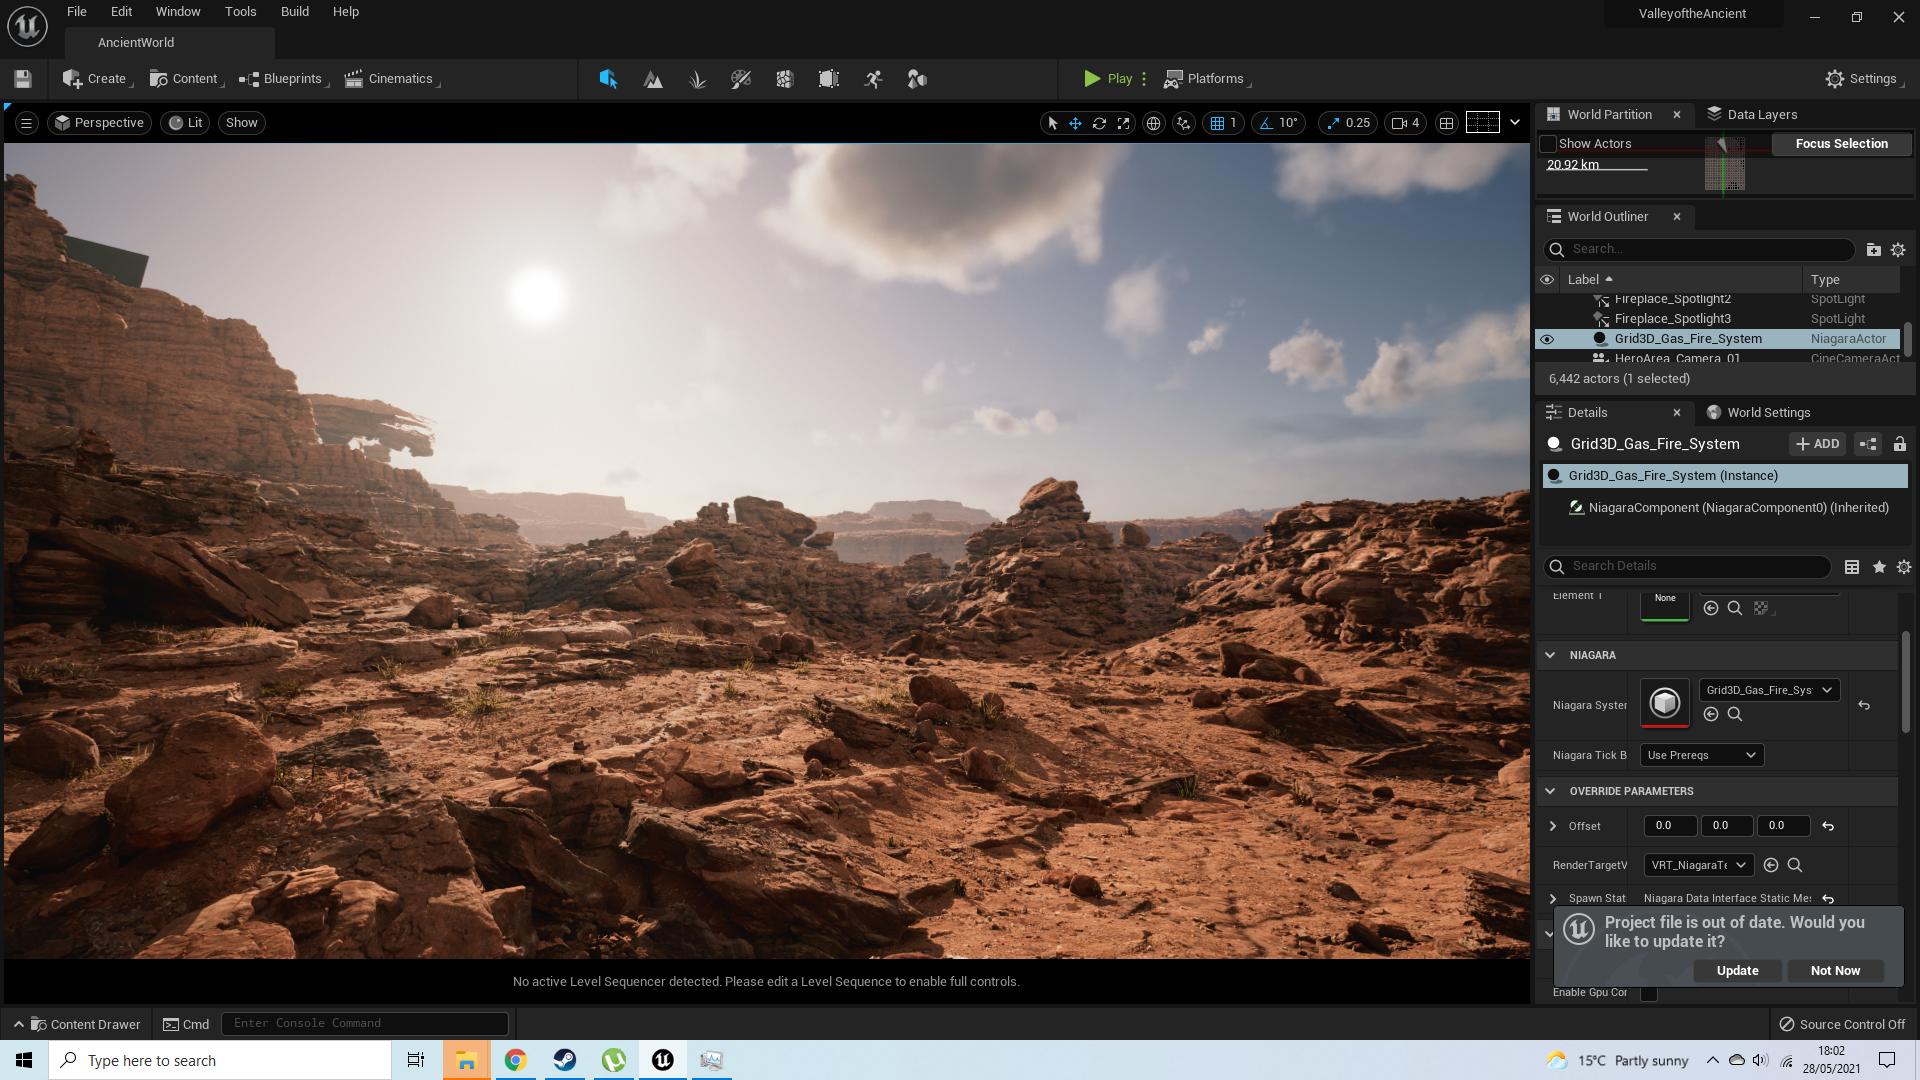 desktopscreenshot2021vzk3p.png